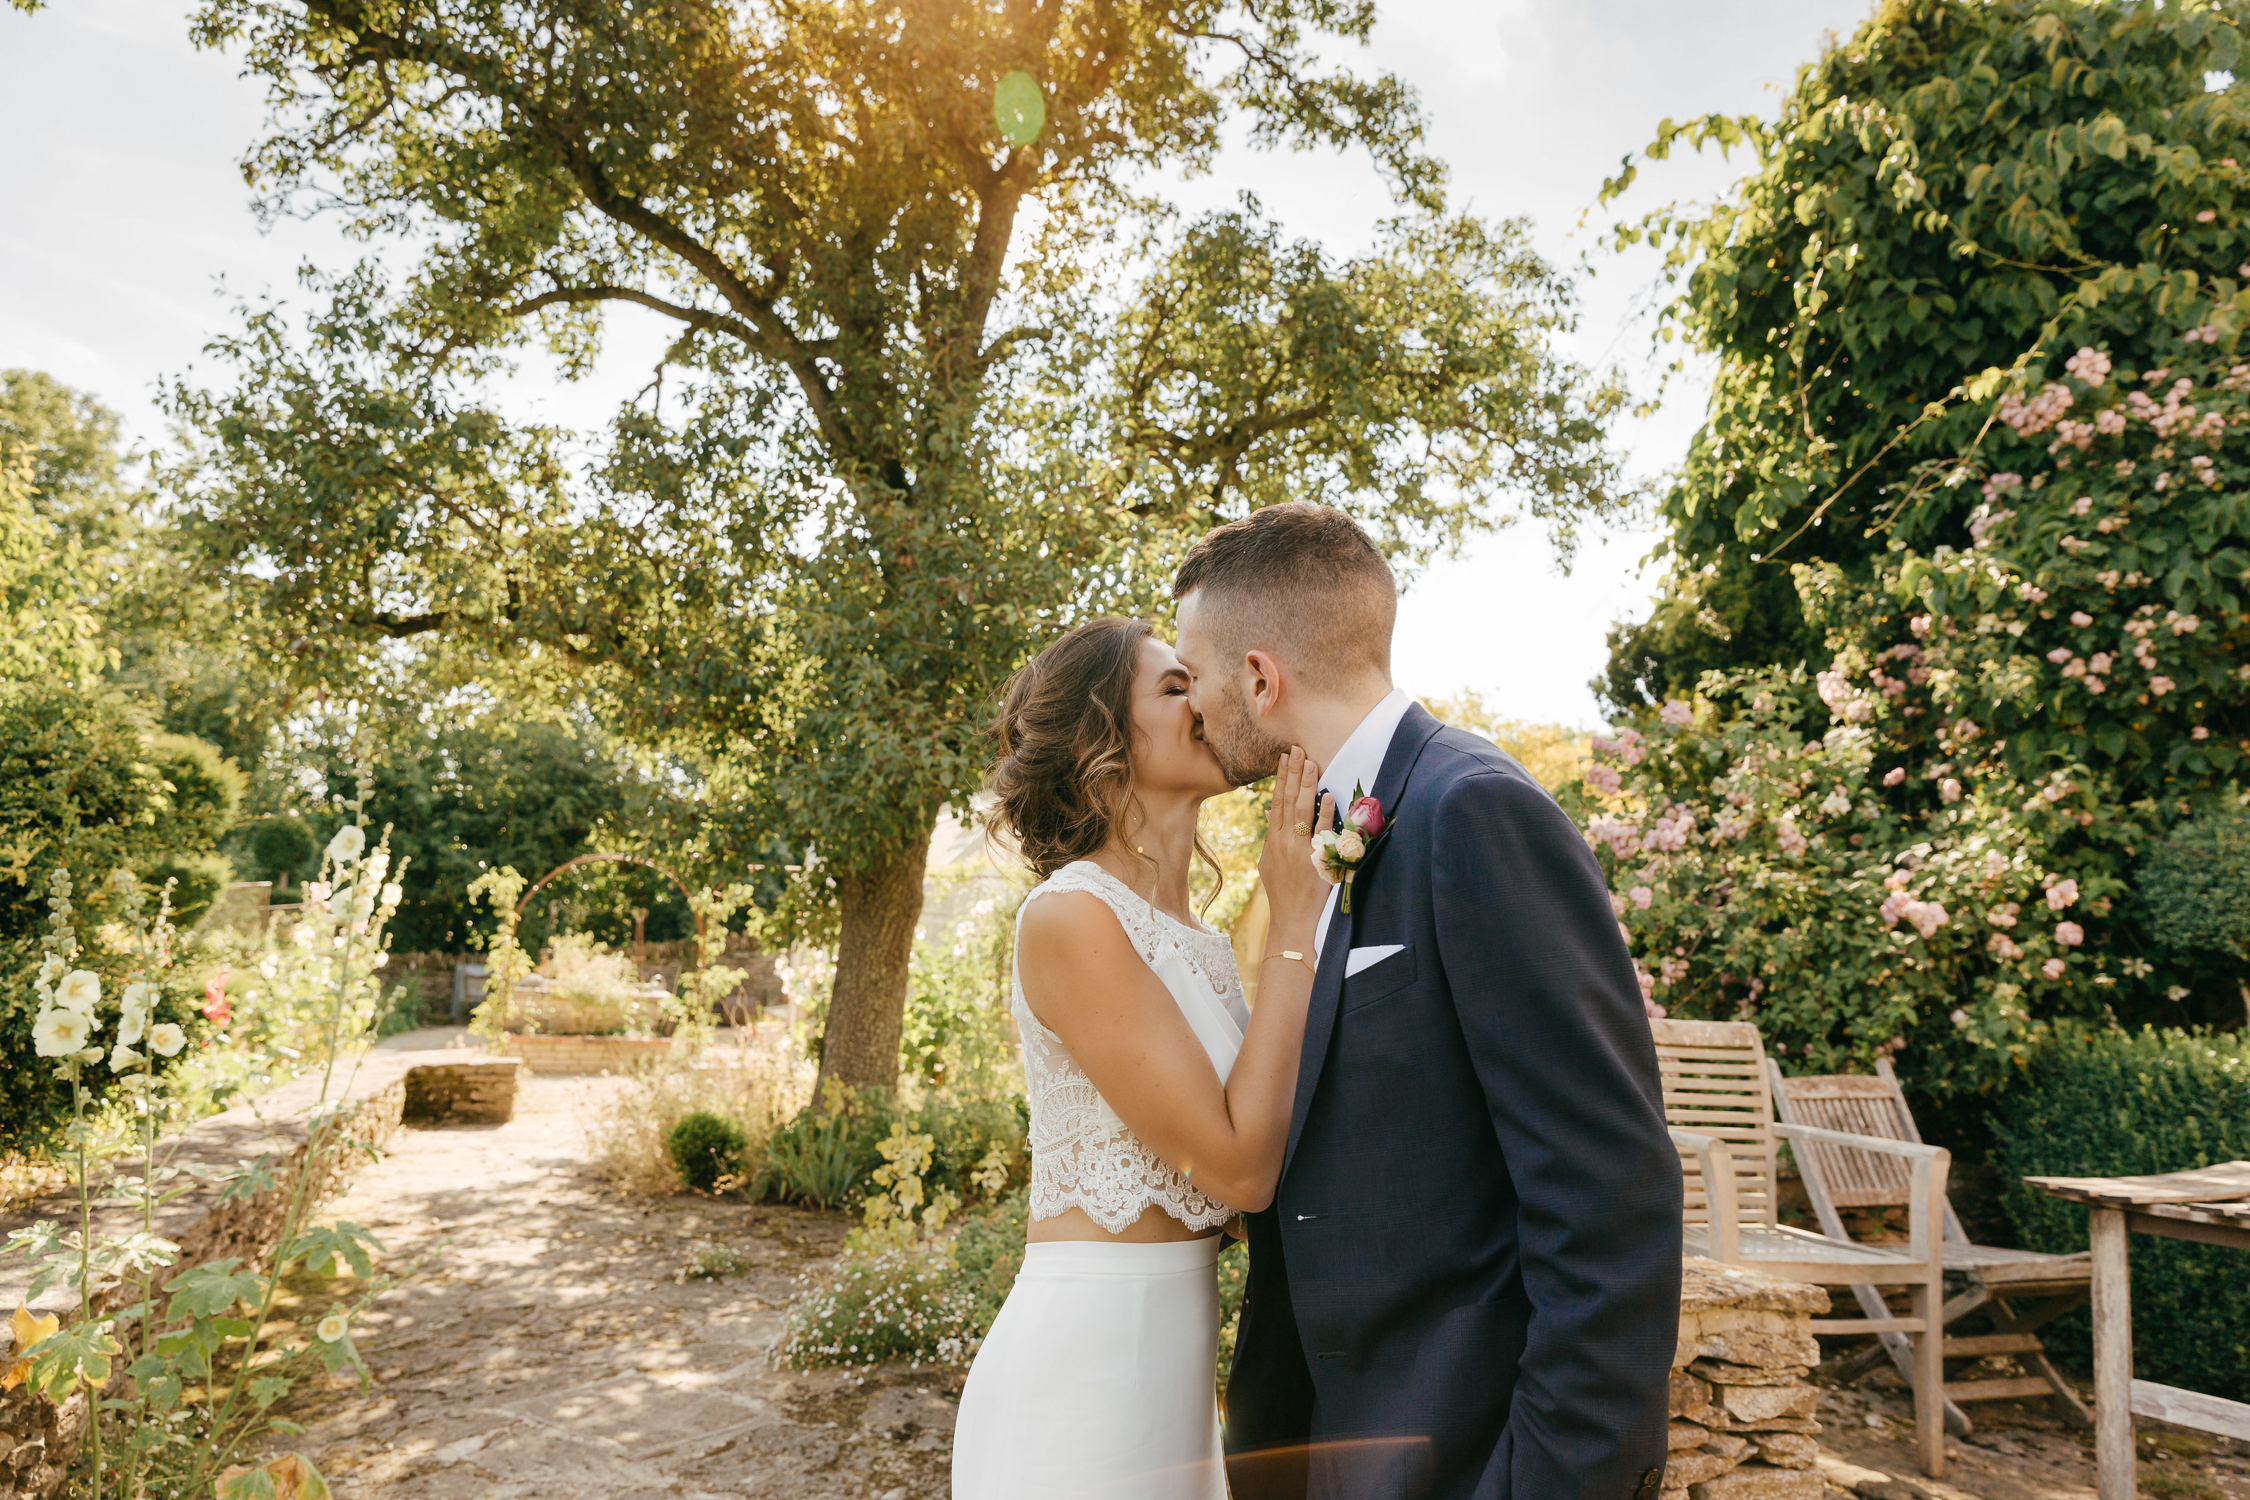 natural wedding photography at oxleaze barn summer wedding